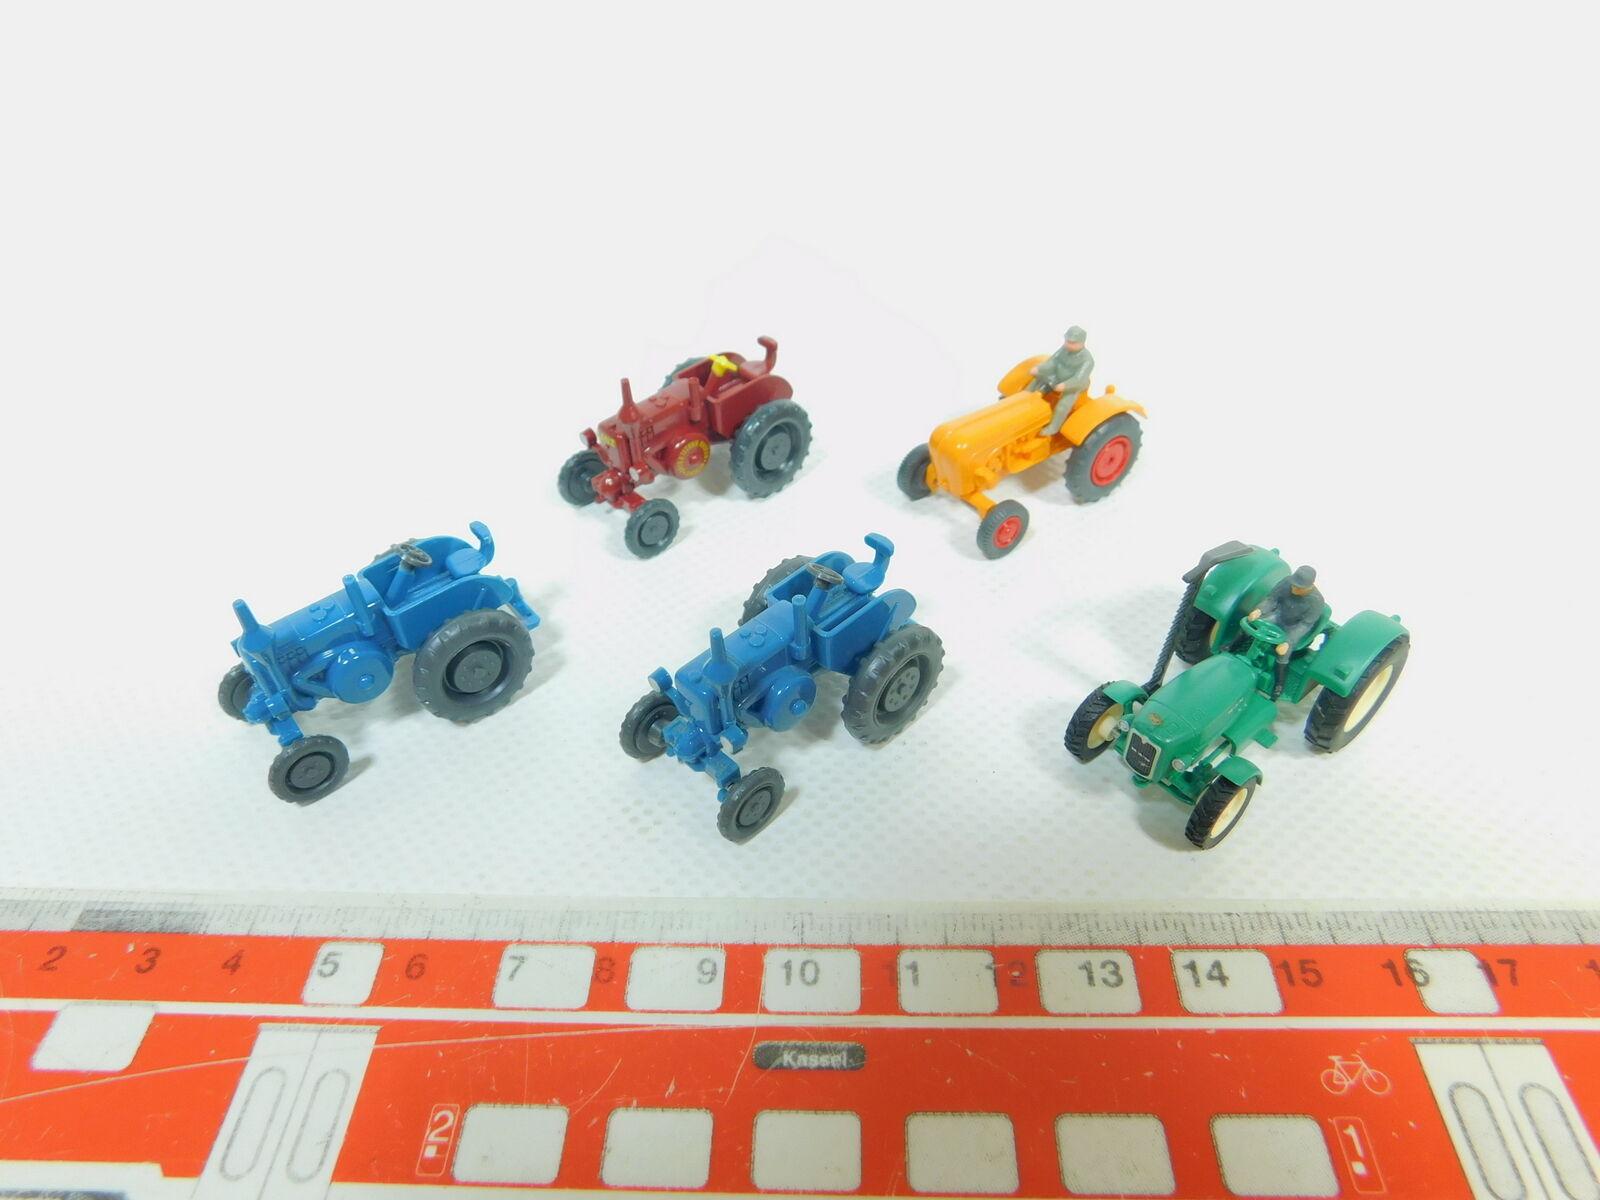 BO492-0, 5 x Wiking H0   1 1 1 87 Tractor Bulldog Tractor  Porsche etc. , Mint 5d2b79